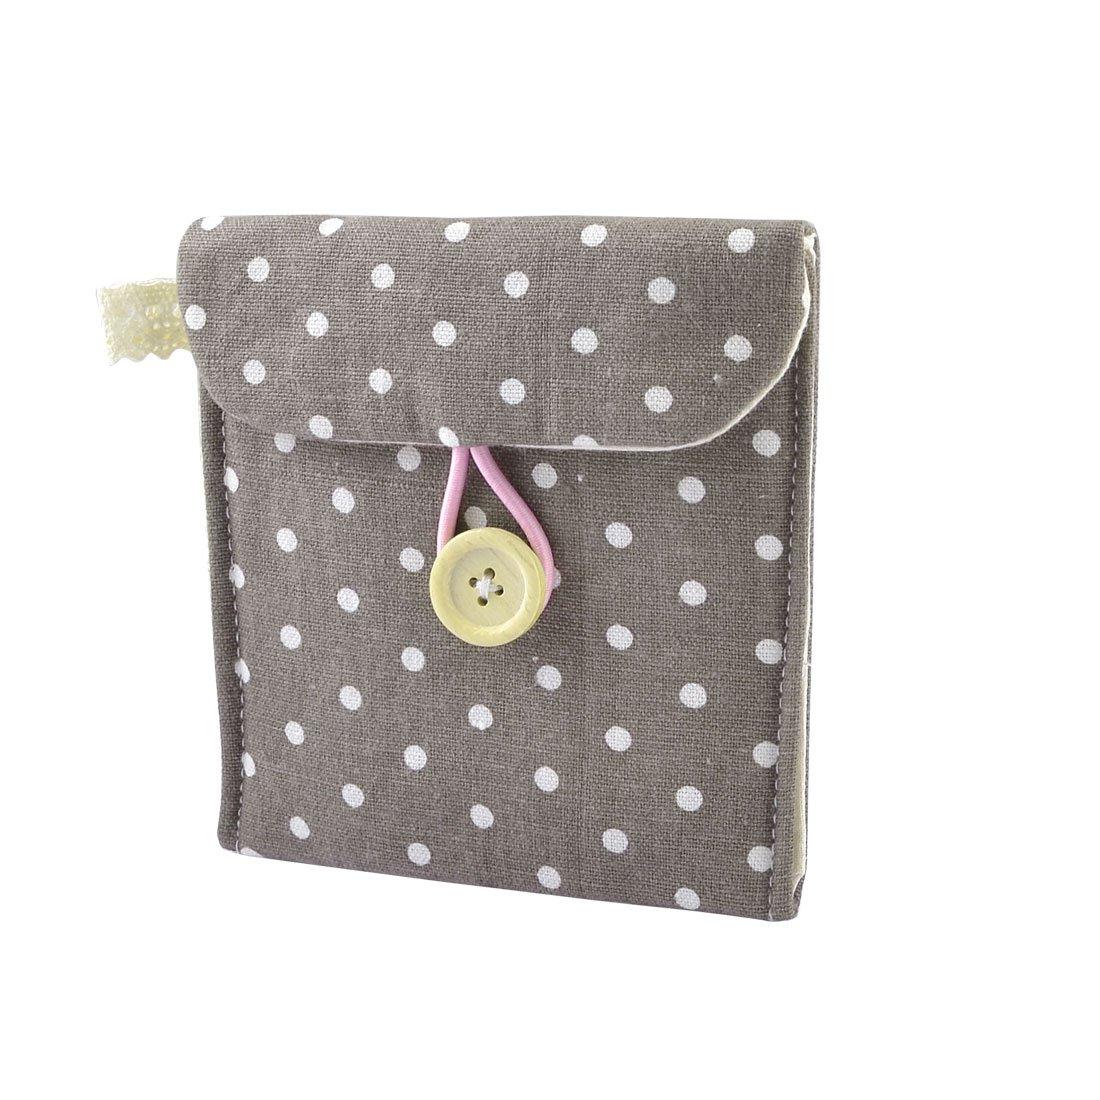 Hot Girl Cotton Blends Polka Dots Sanitary Pad Holder Button Bag Case Gray White